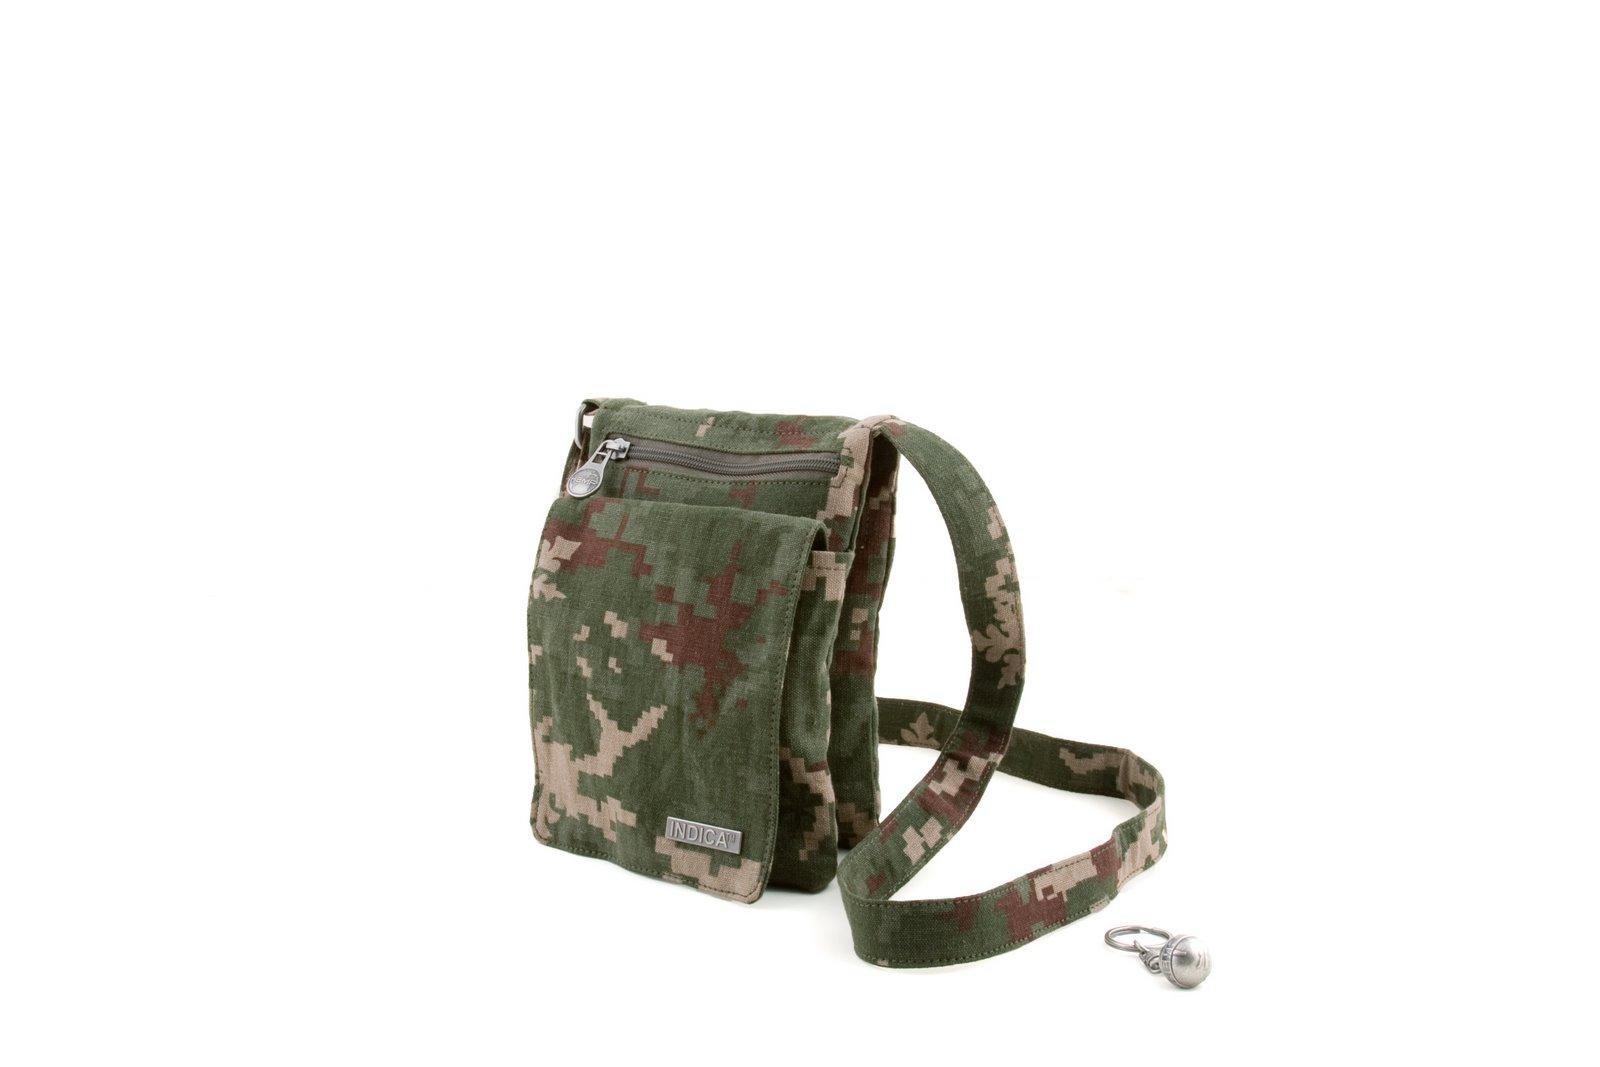 Saitva Bags - Canno - Small Shoulder Bag